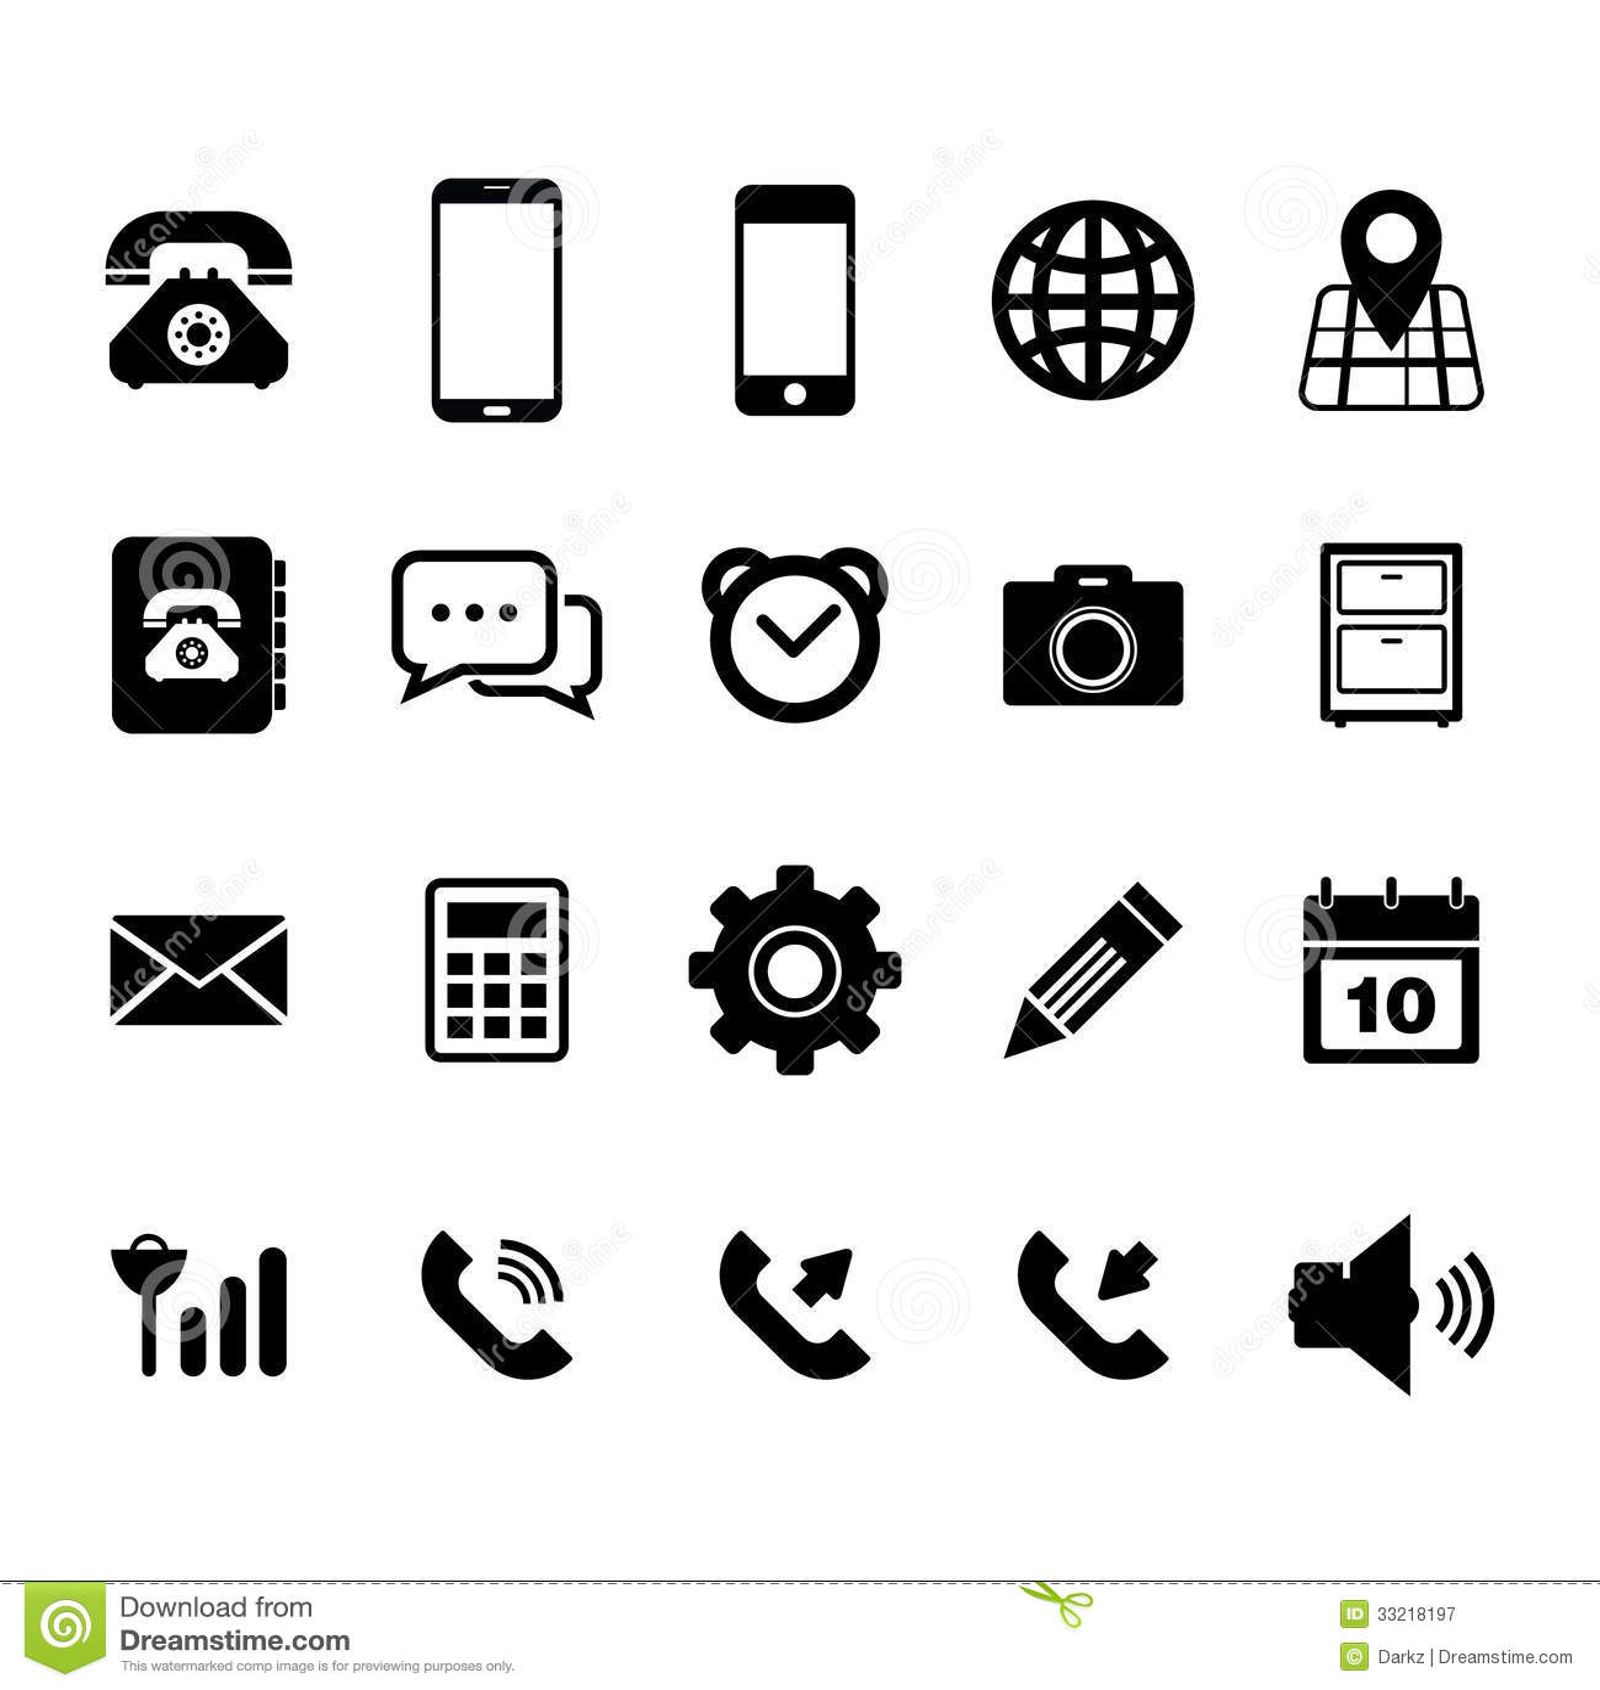 Icono del teléfono móvil